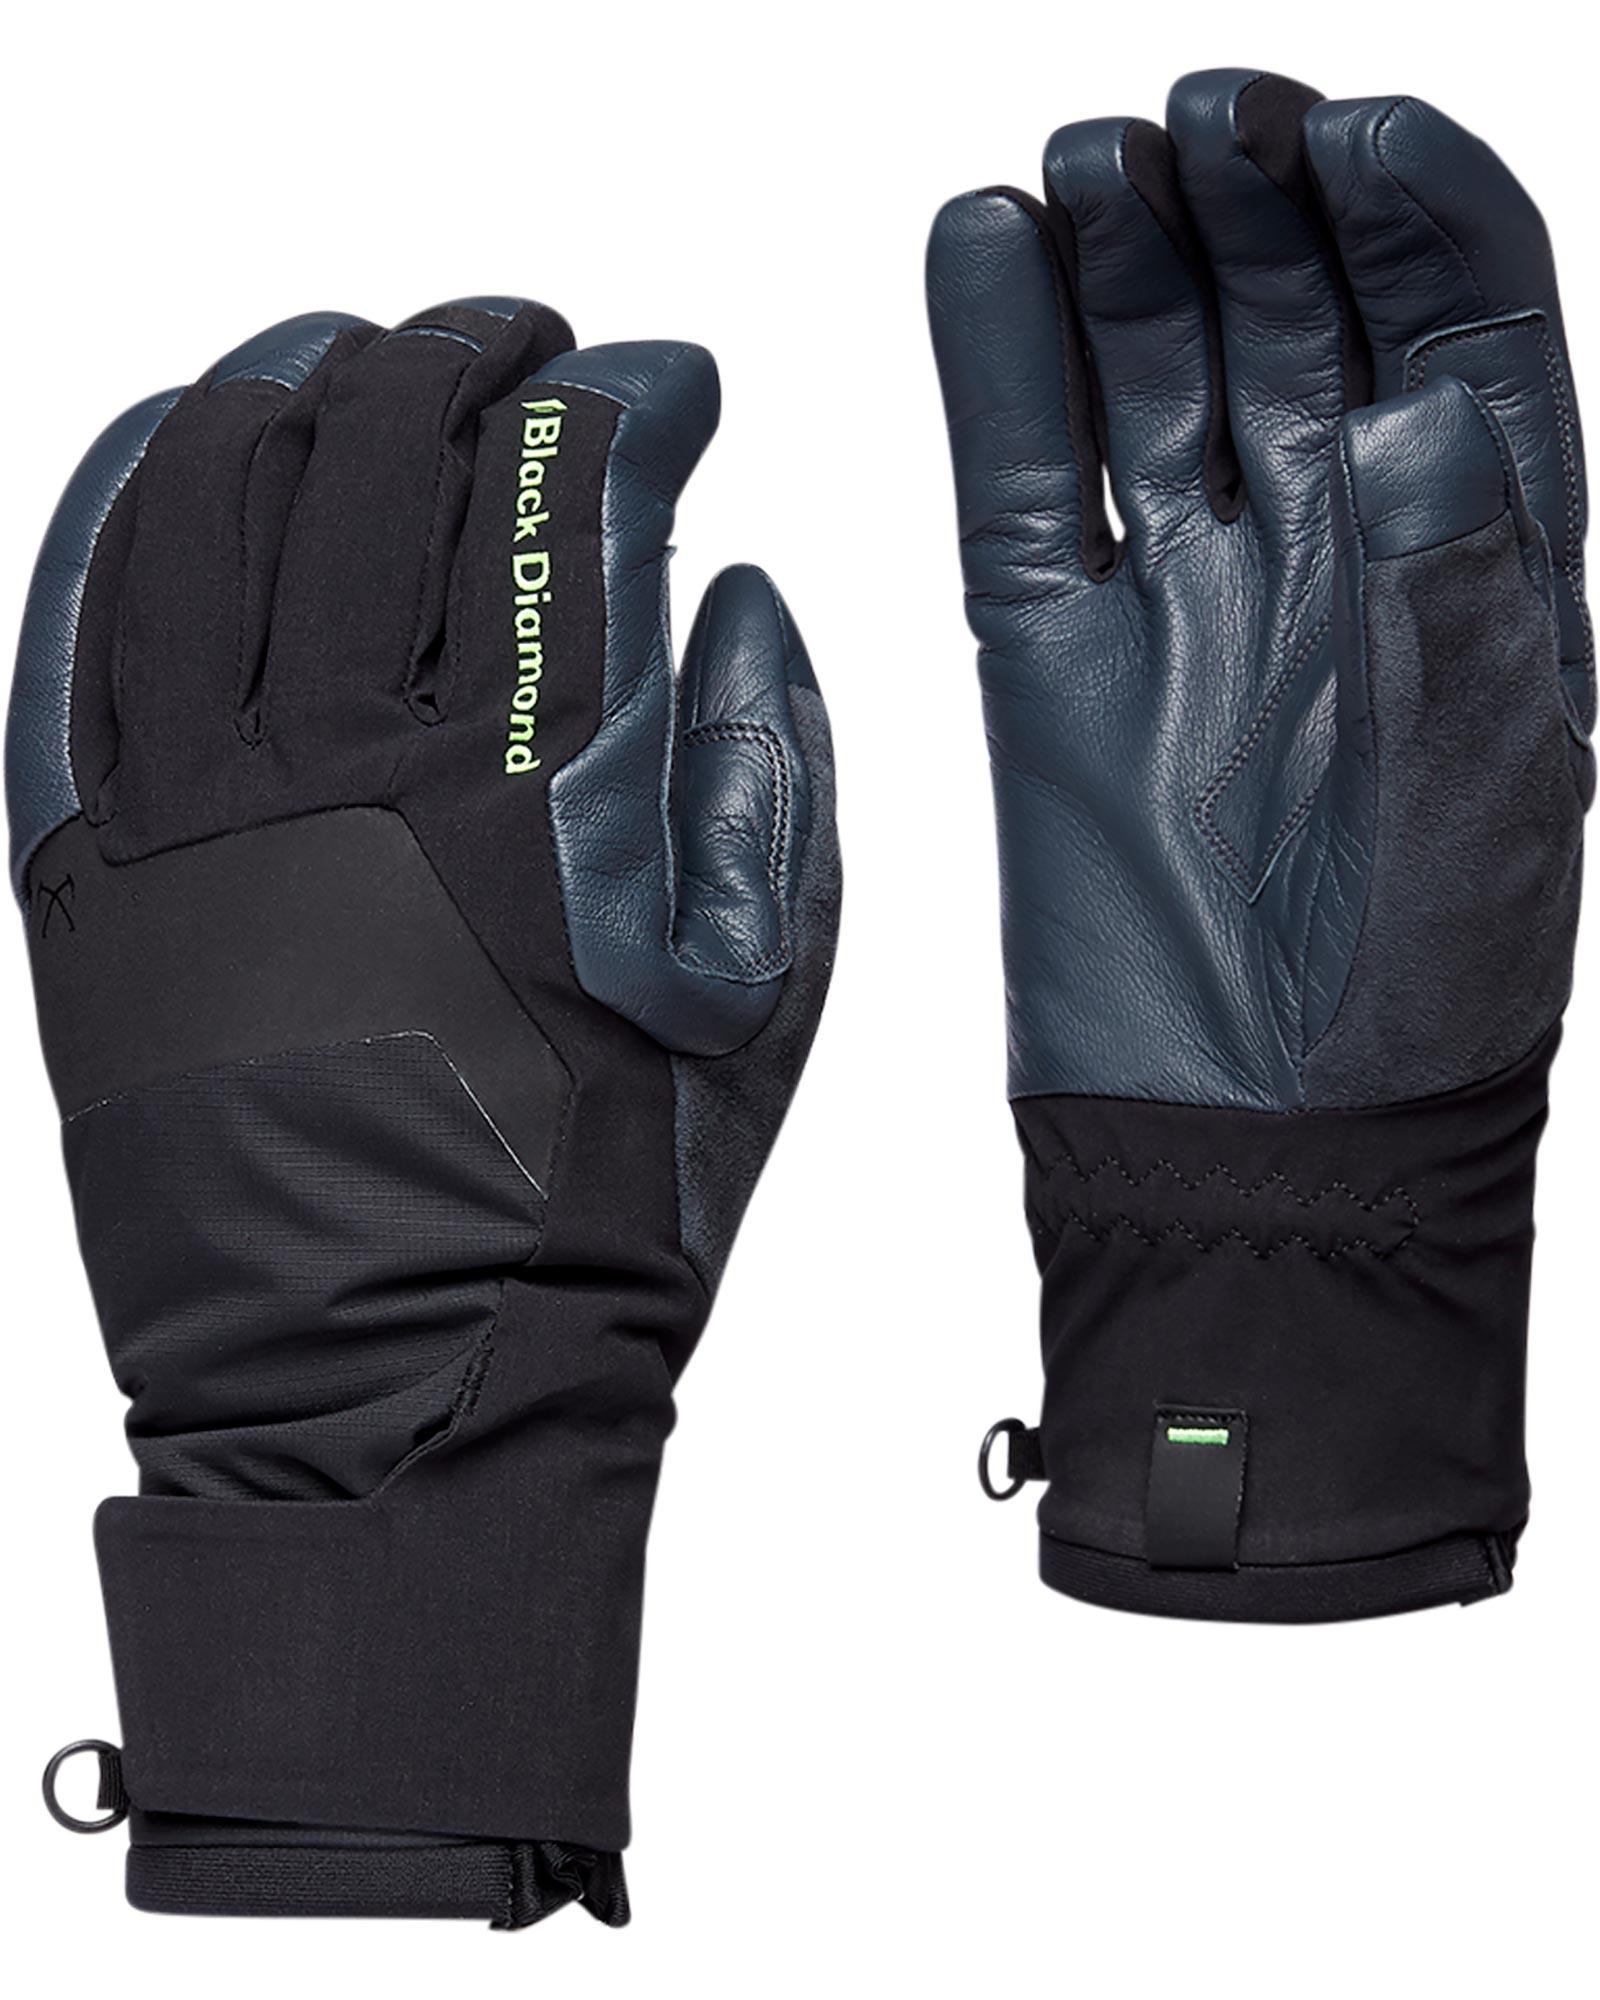 Black Diamond Punisher Gloves 0